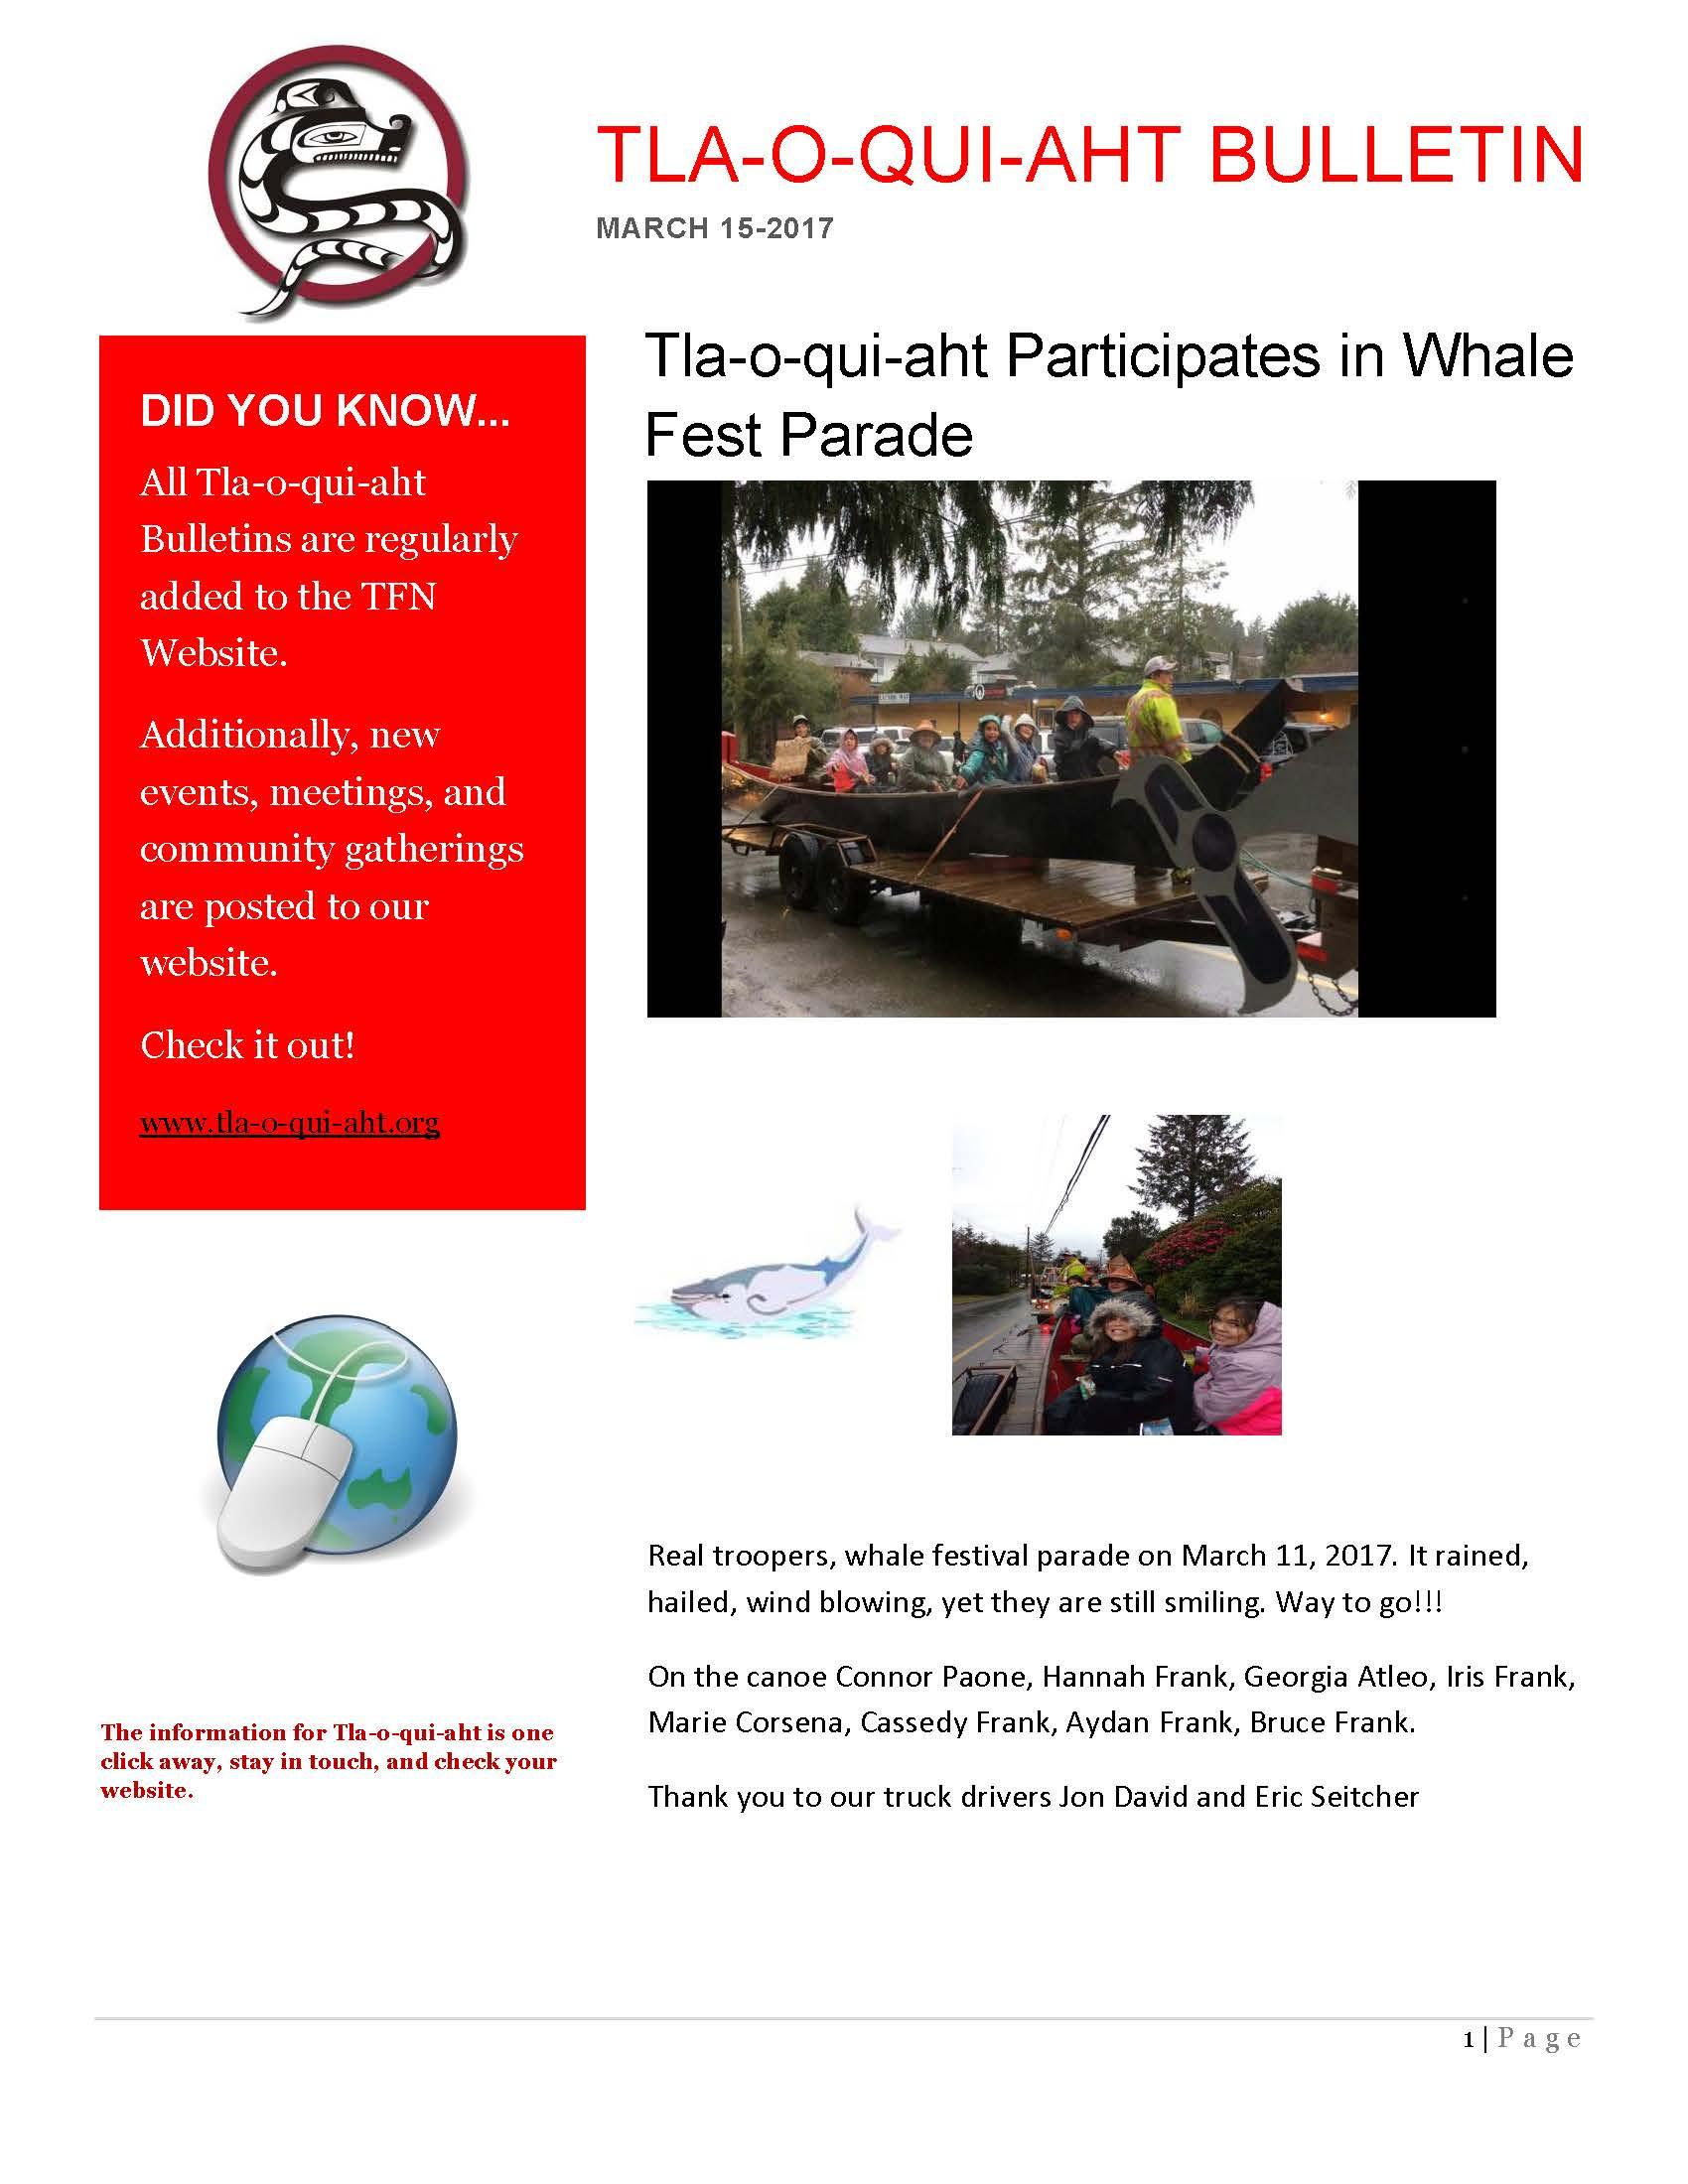 TFN Bulletin March 15-2017_Page_01.jpg